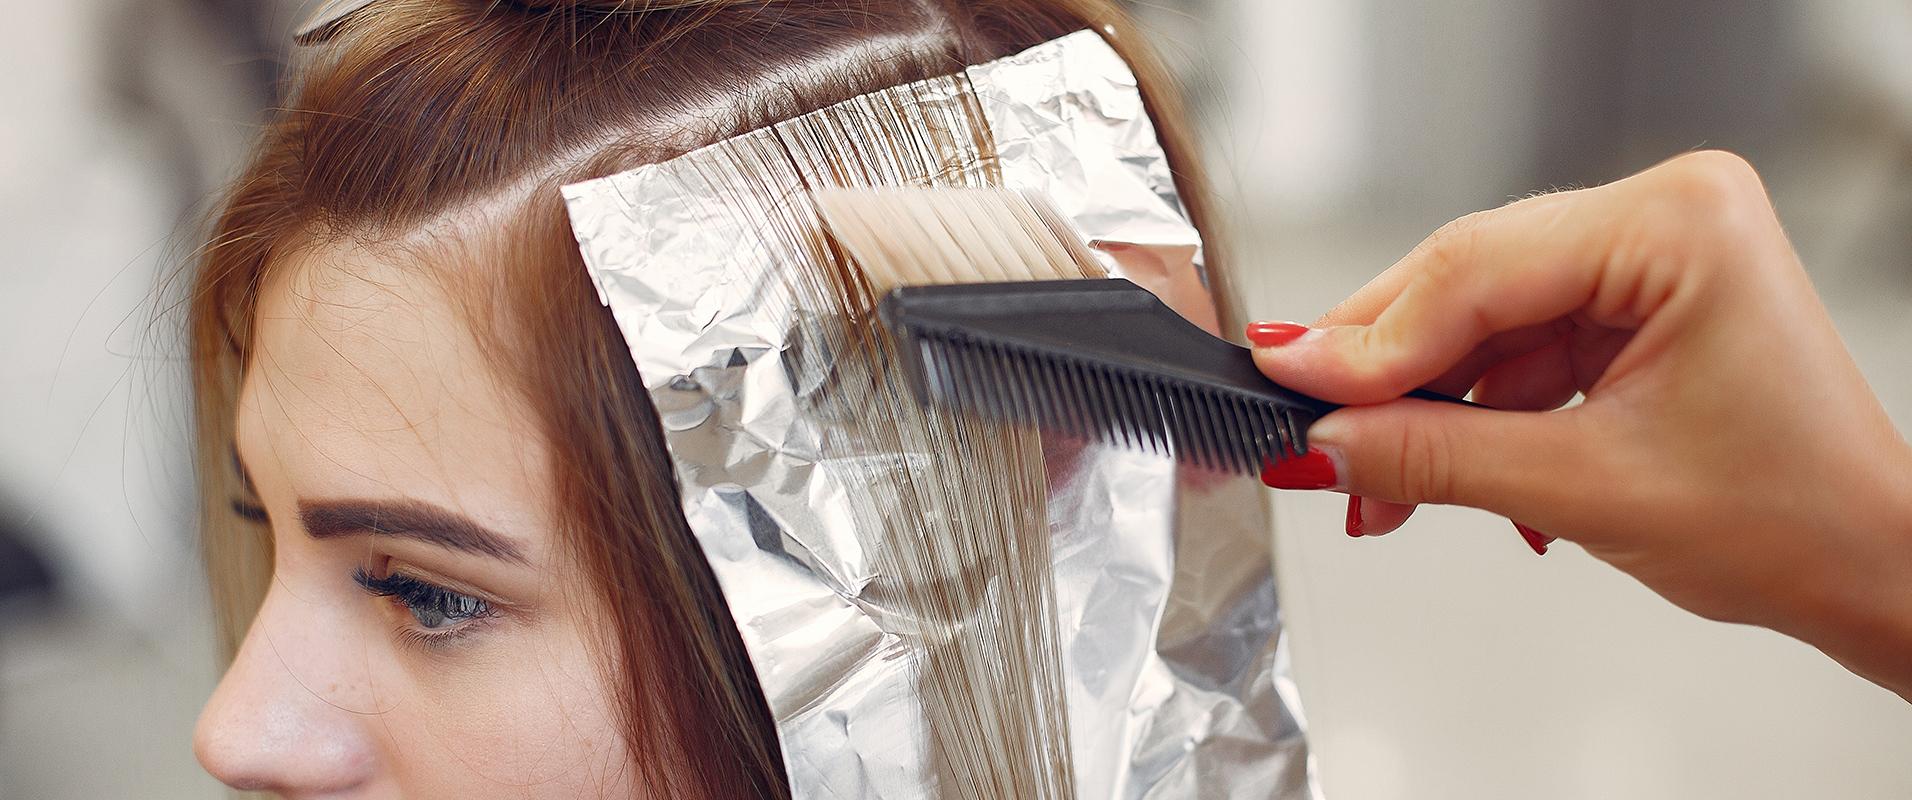 Salon de coiffure à Villars-sur-Glâne